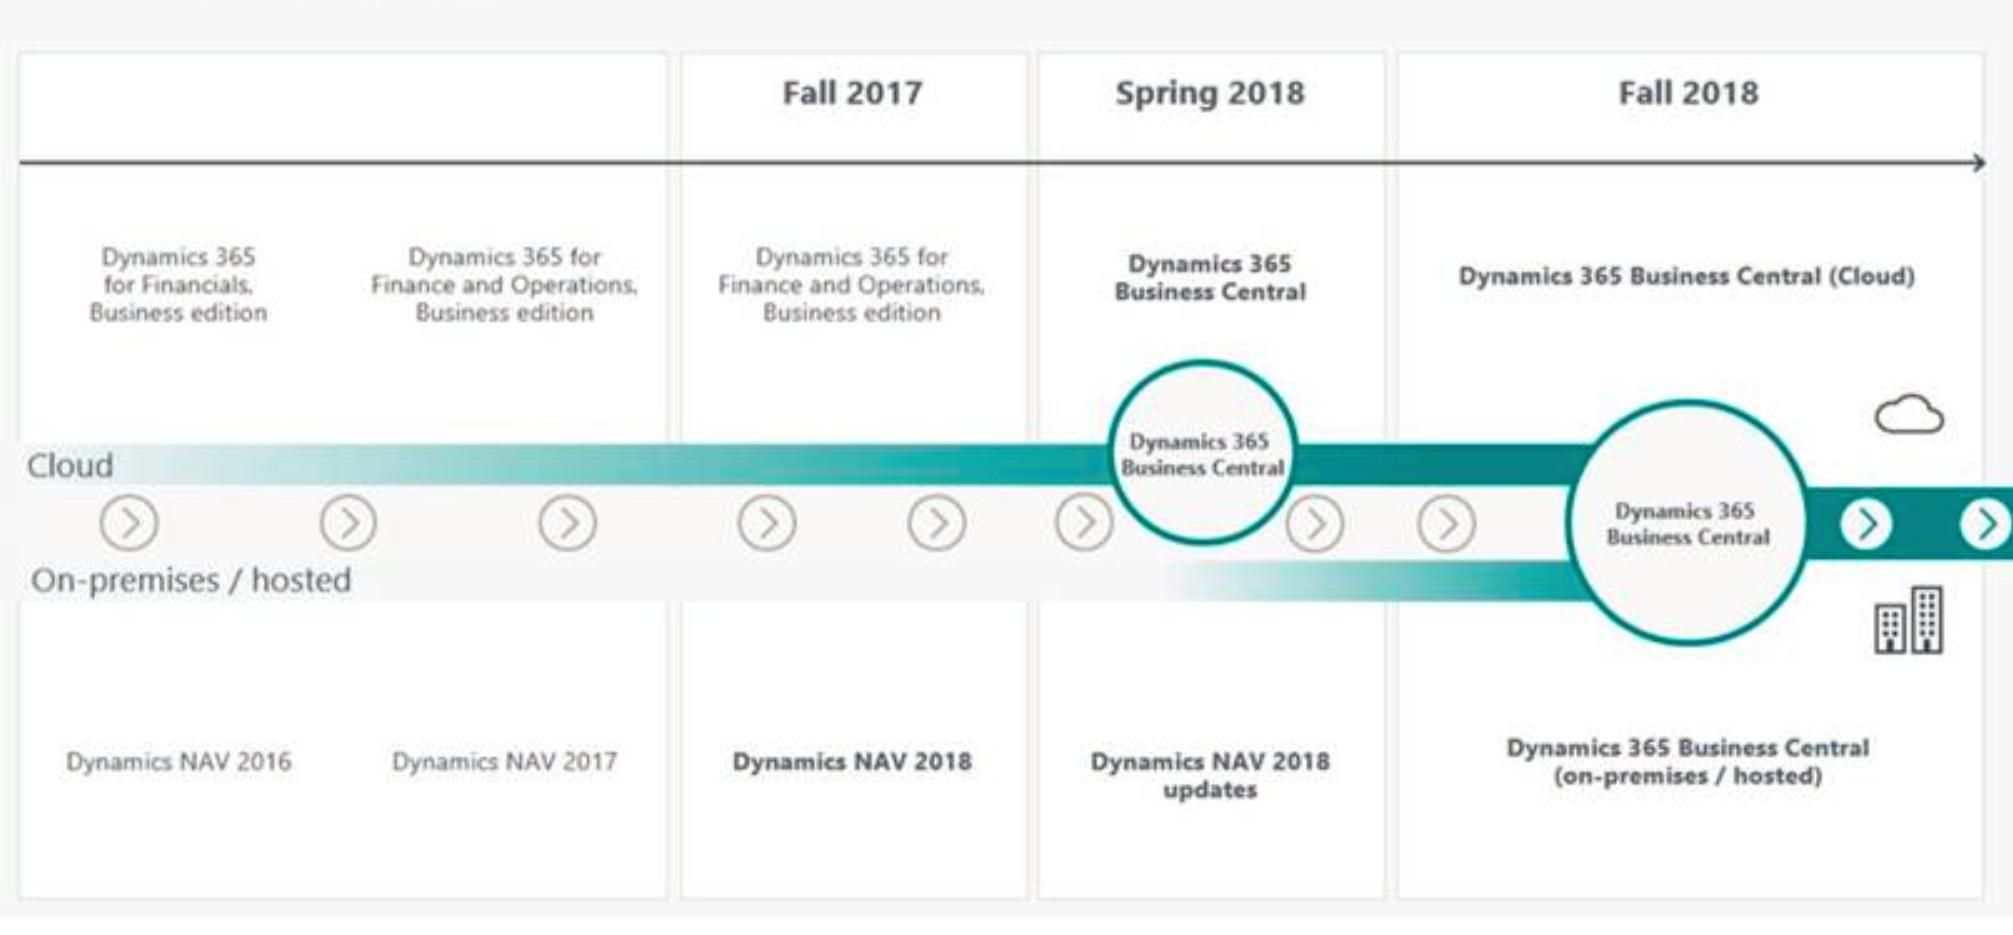 Dynamics 365 Business Central and Dynamics NAV (Navision) Roadmap